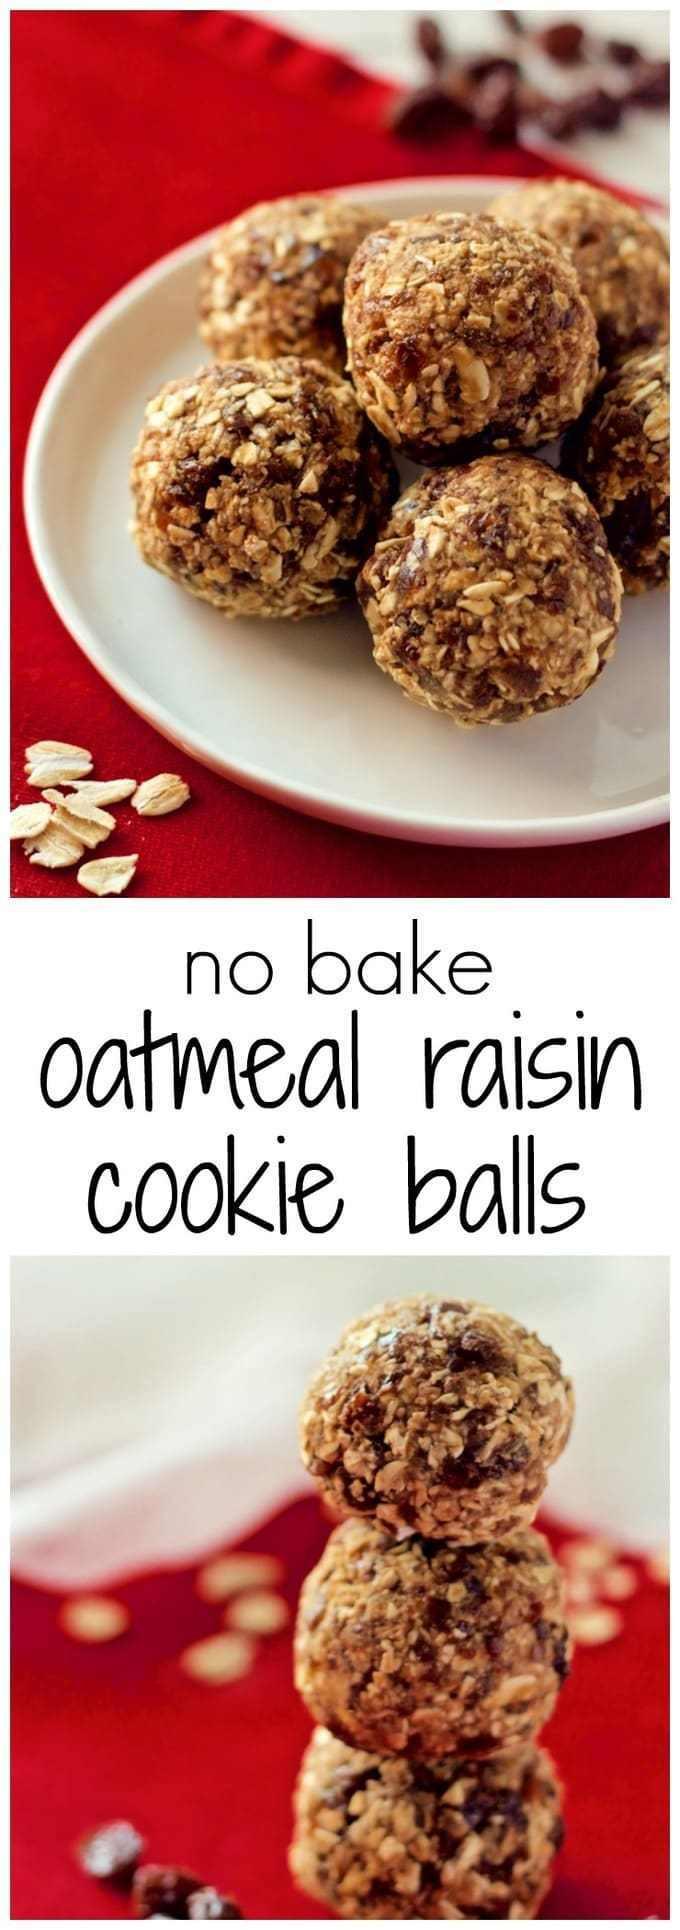 No Bake Oatmeal Cookies Healthy  No bake oatmeal raisin cookie balls Family Food on the Table